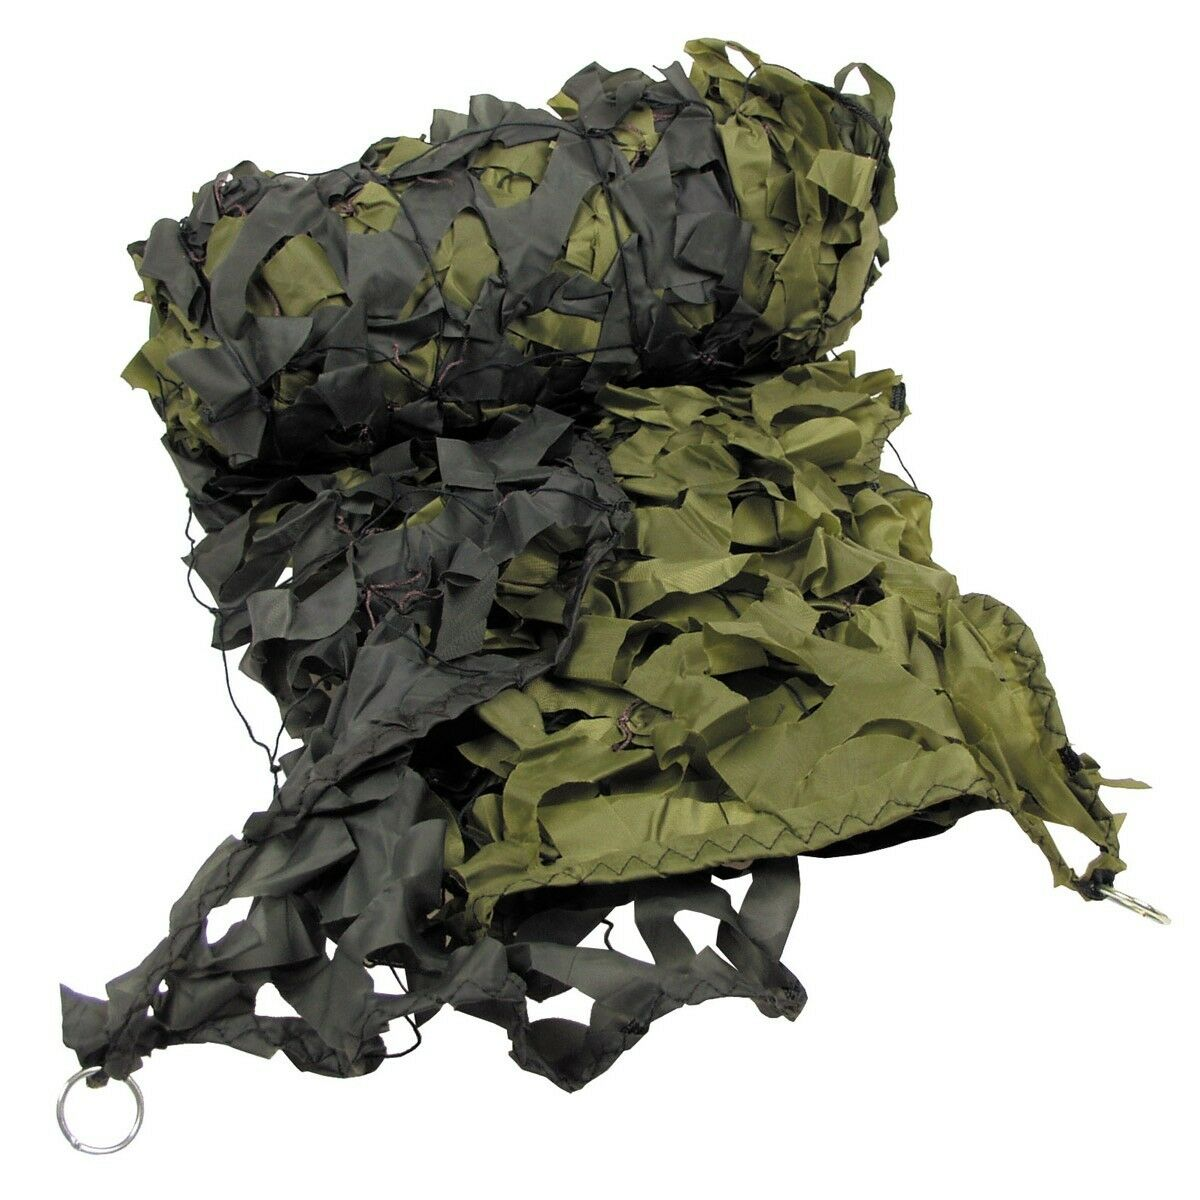 MFH Towel Network crosslinked Hunting Fishing Outdoor Camping  Military 27871b Green  popular